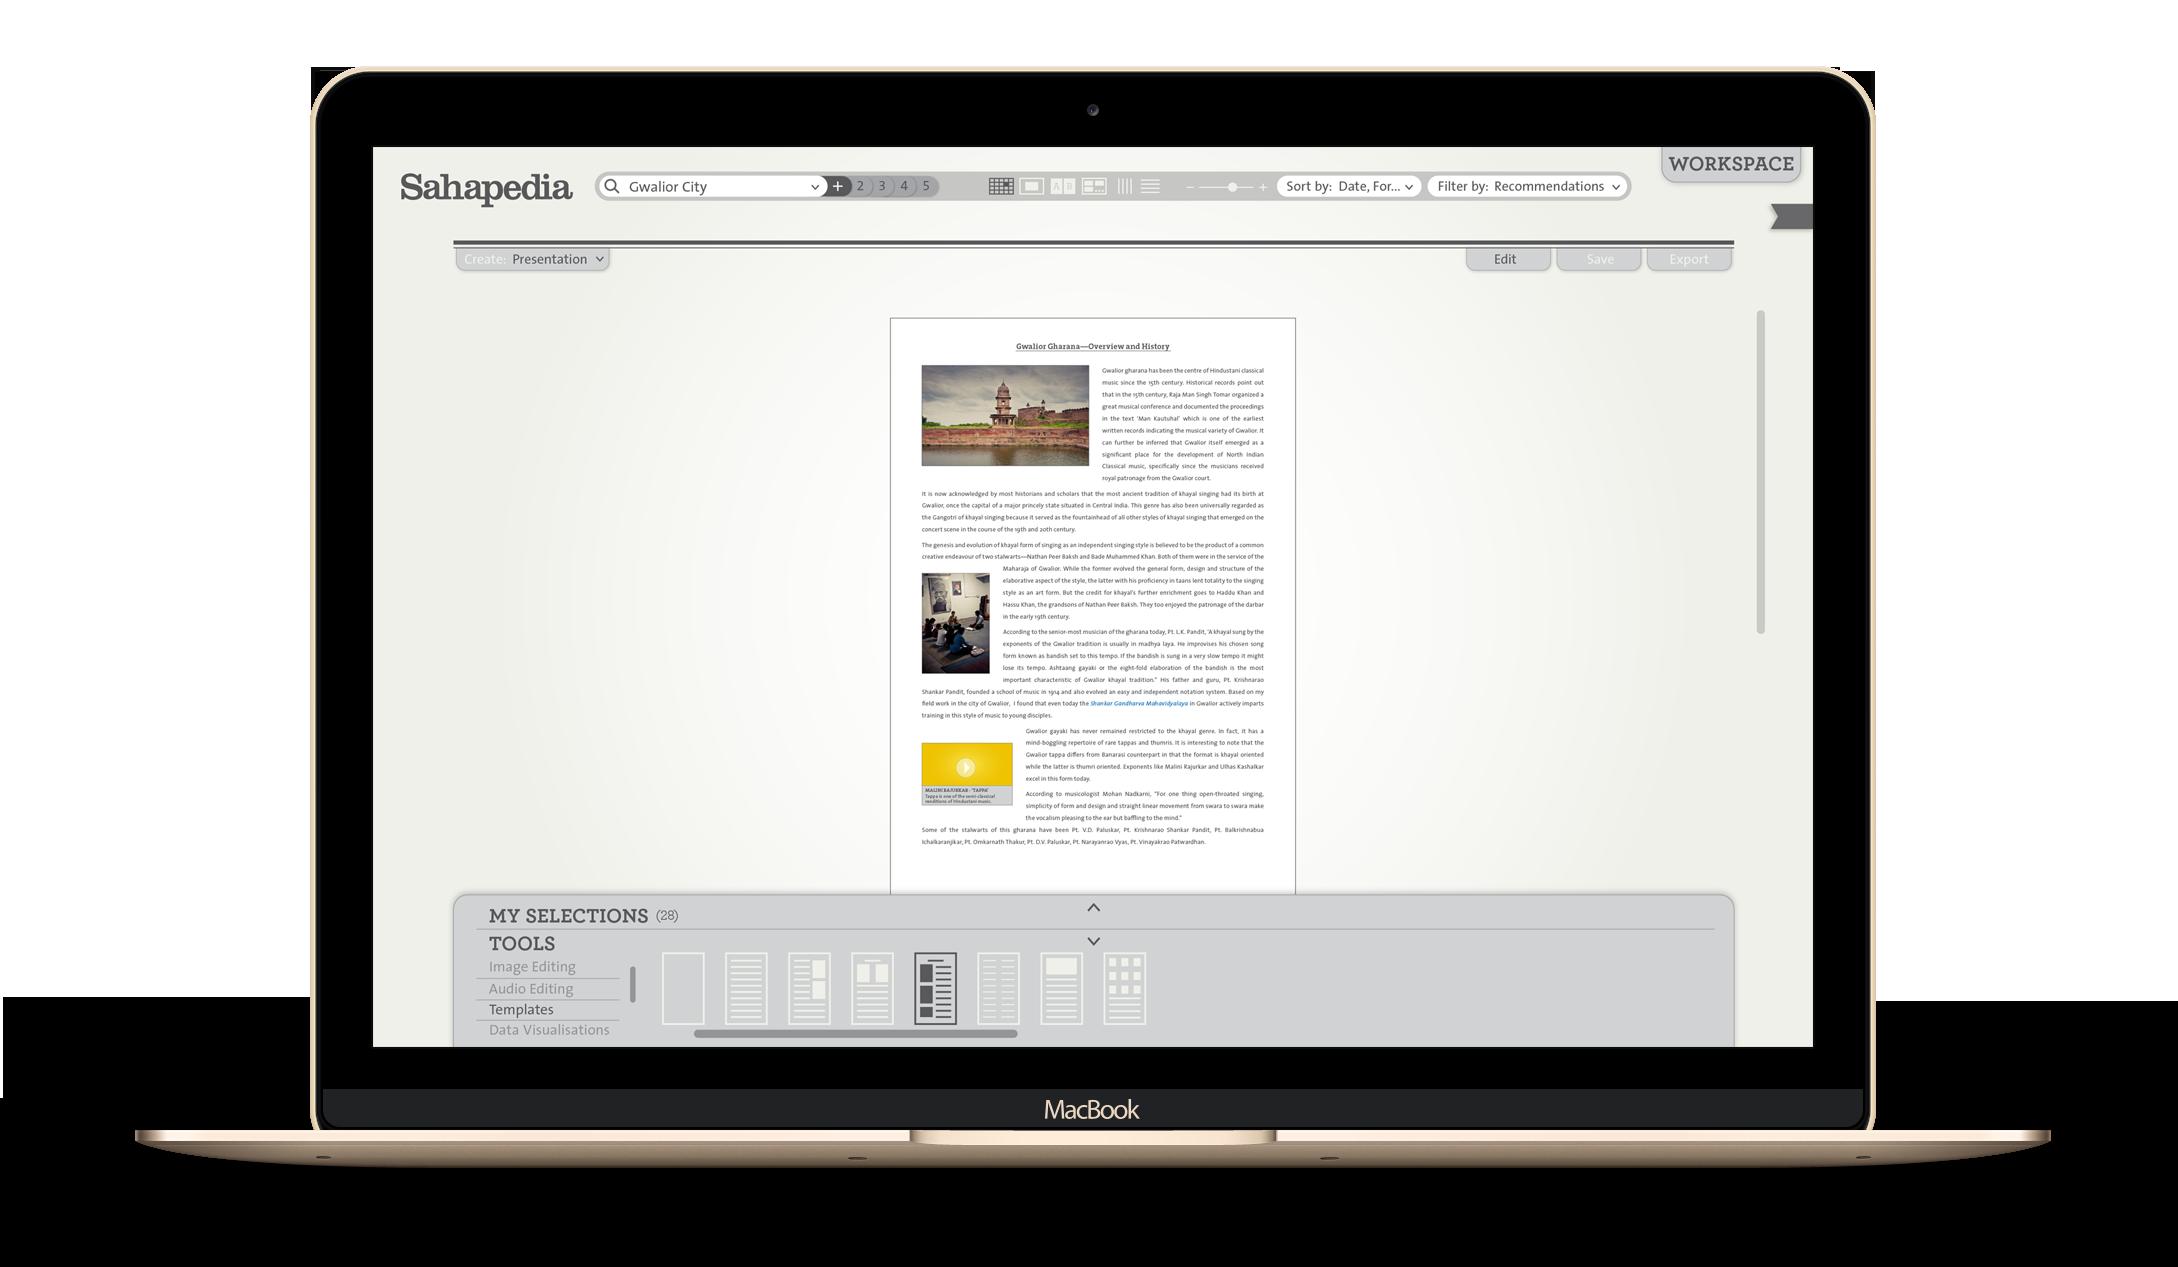 Workspace - Sahapedia - by Kiba Design